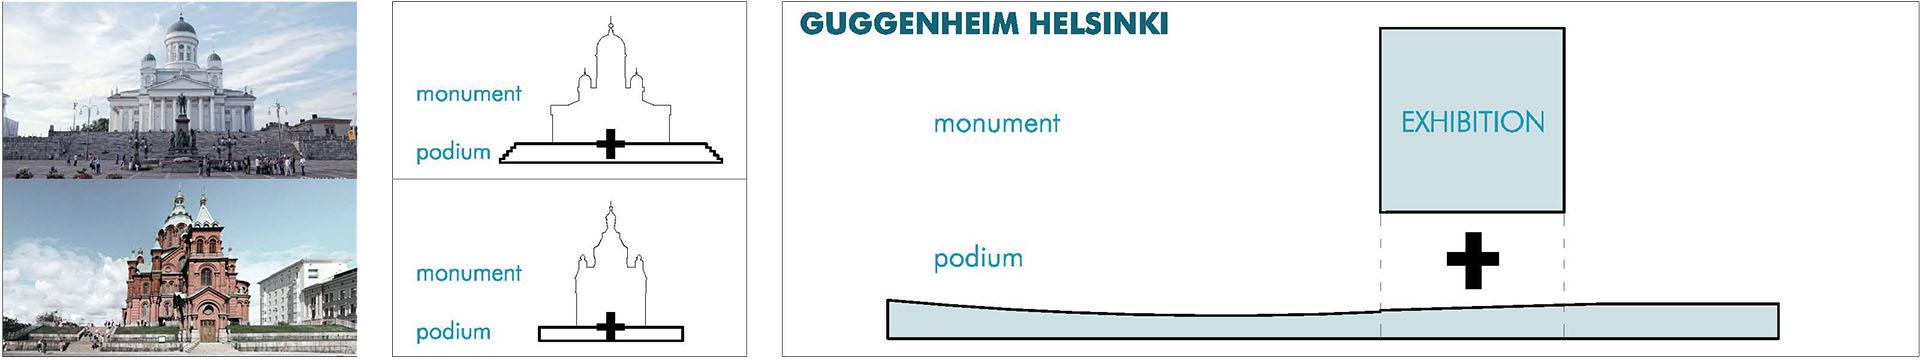 PLAYstudio_Guggenheim-Helsinki_Diagrama (1)